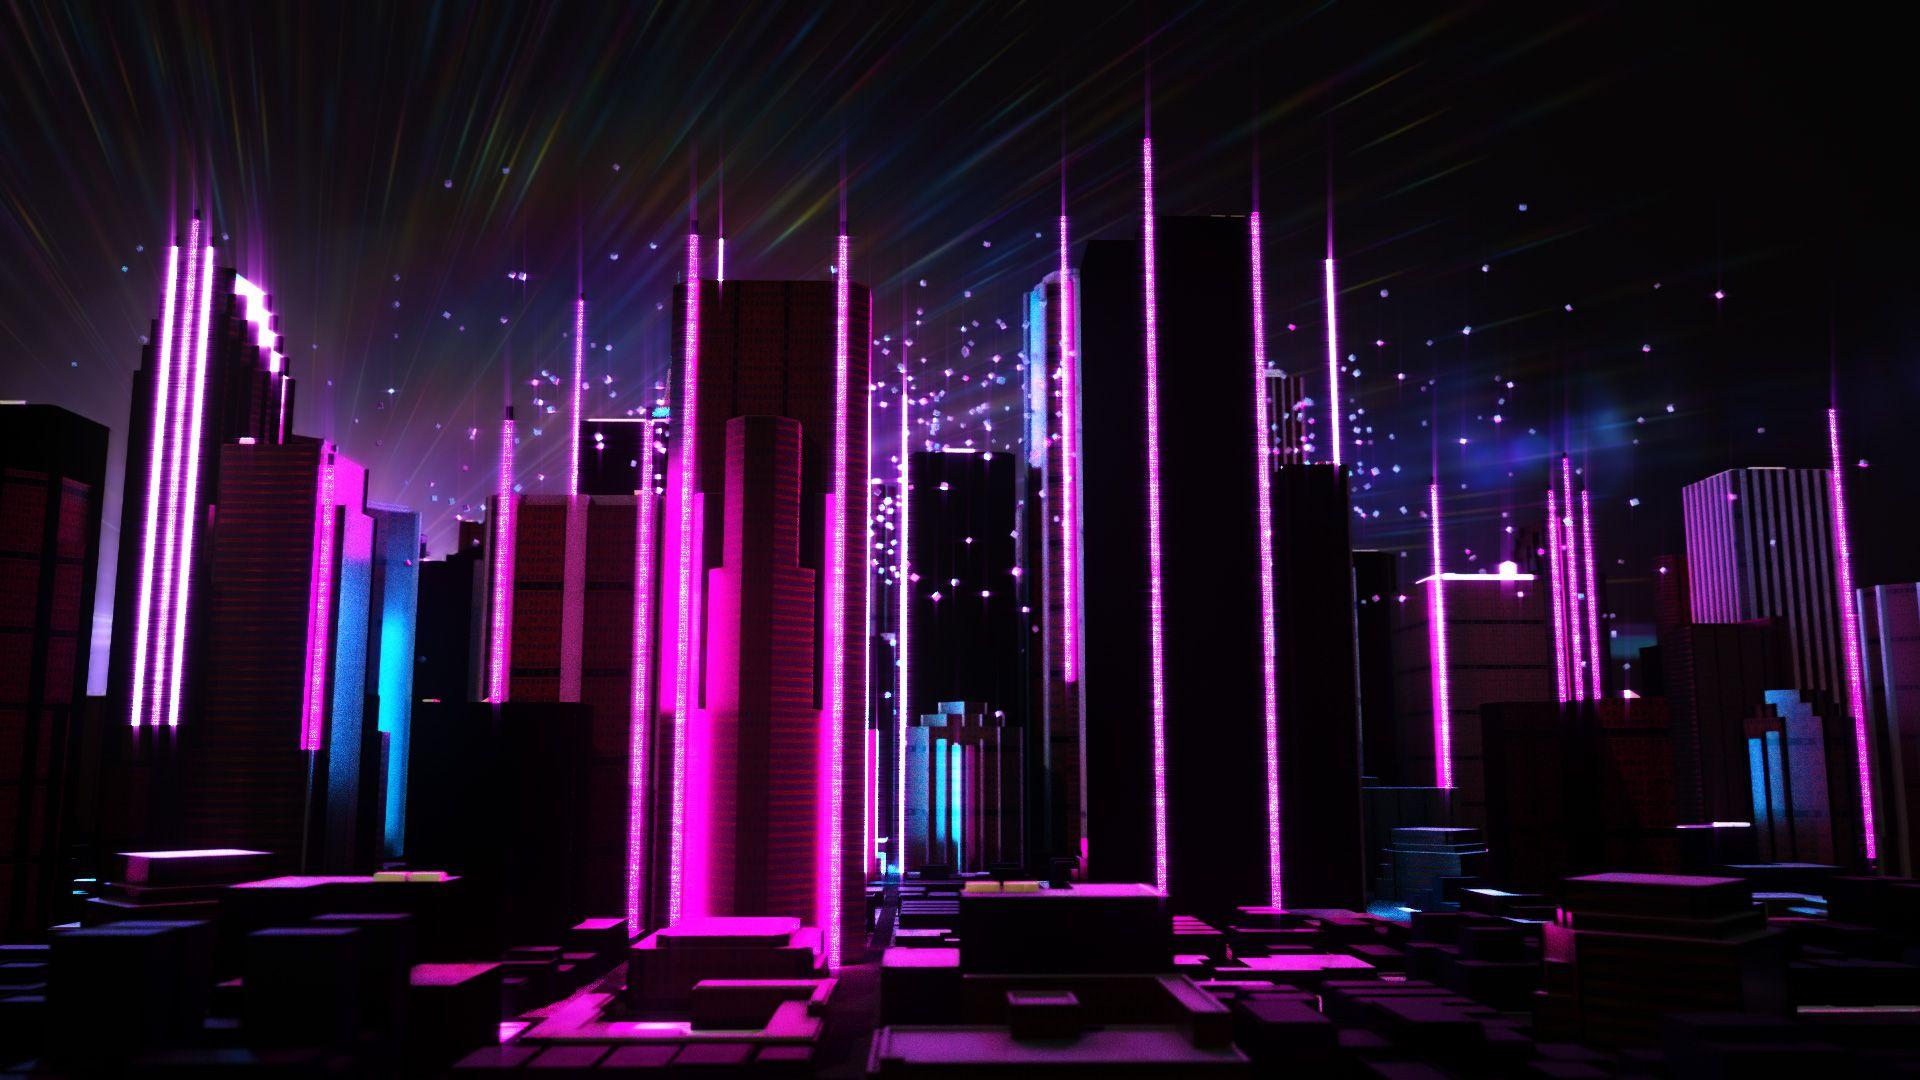 Neon City Purple City Neon Wallpaper Neon